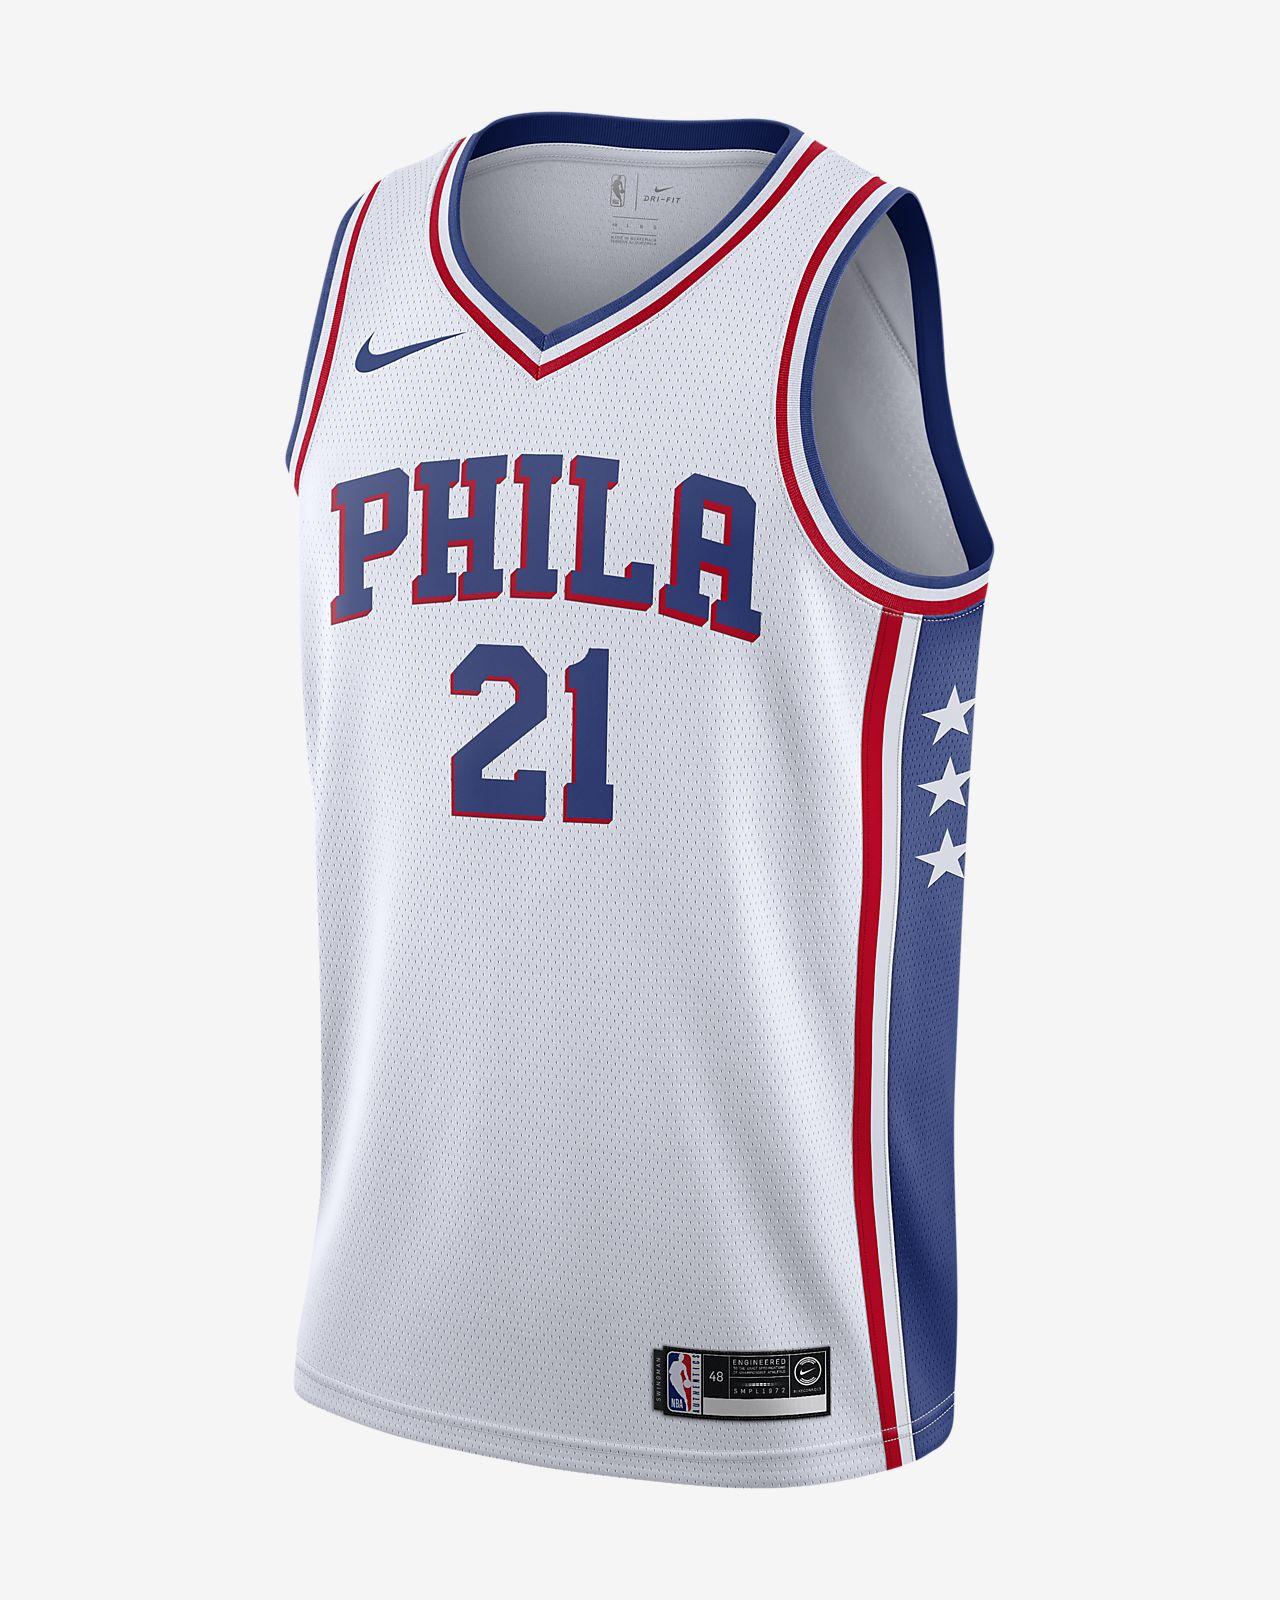 Maglia Nike NBA Connected Joel Embiid Association Edition Swingman (Philadelphia 76ers) - Uomo